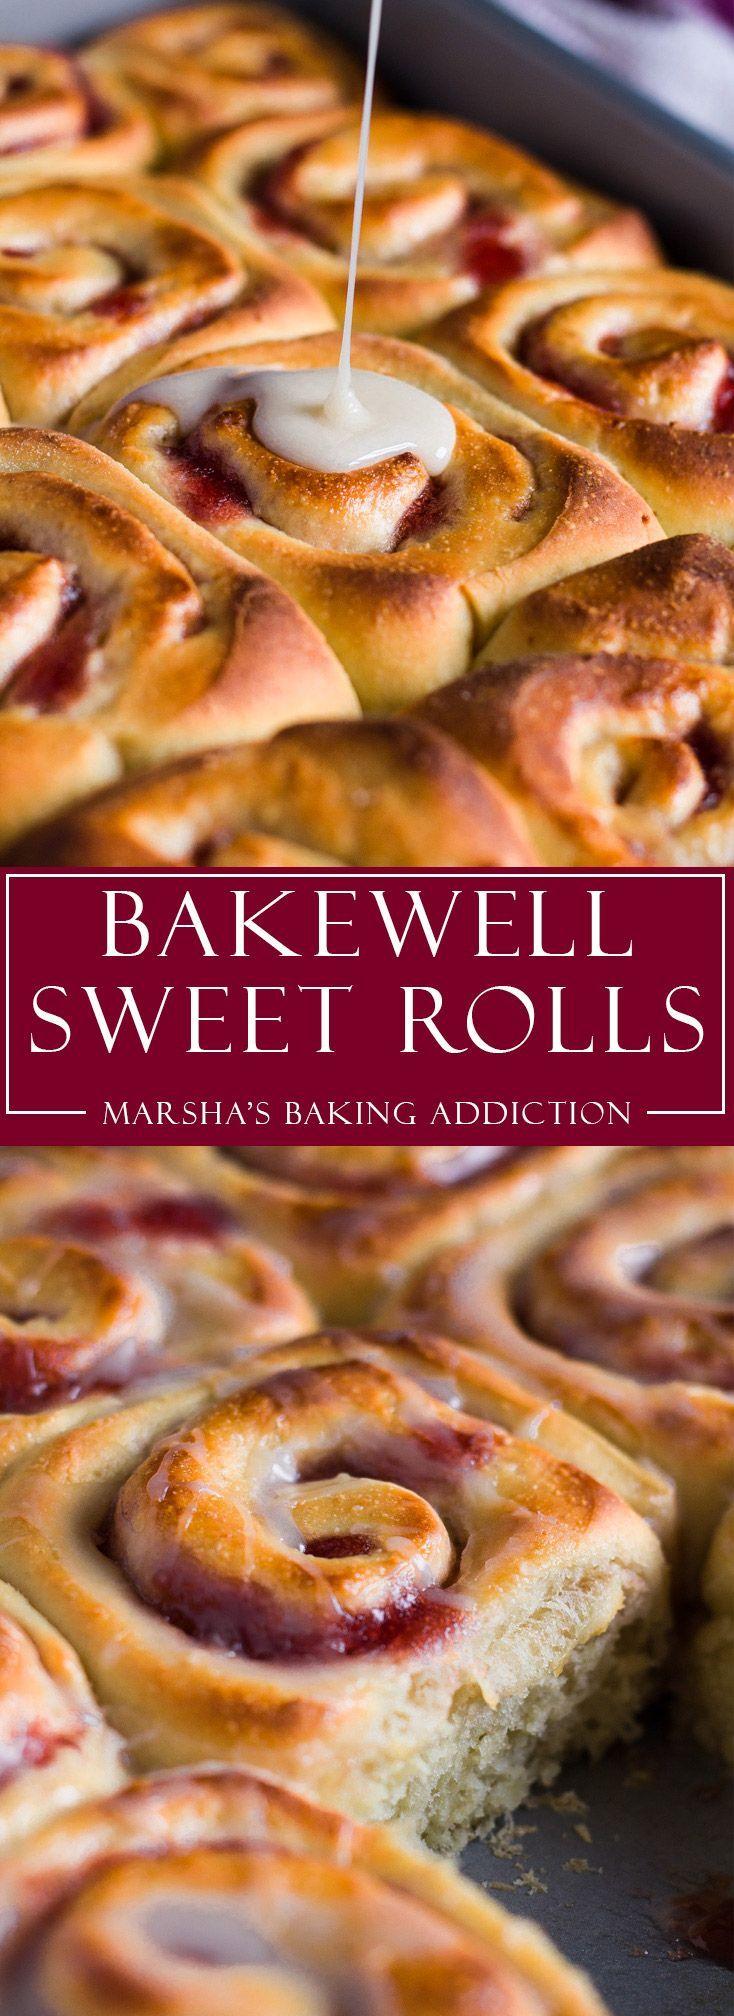 Bakewell Sweet Rolls | http://marshasbakingaddiction.com /marshasbakeblog/